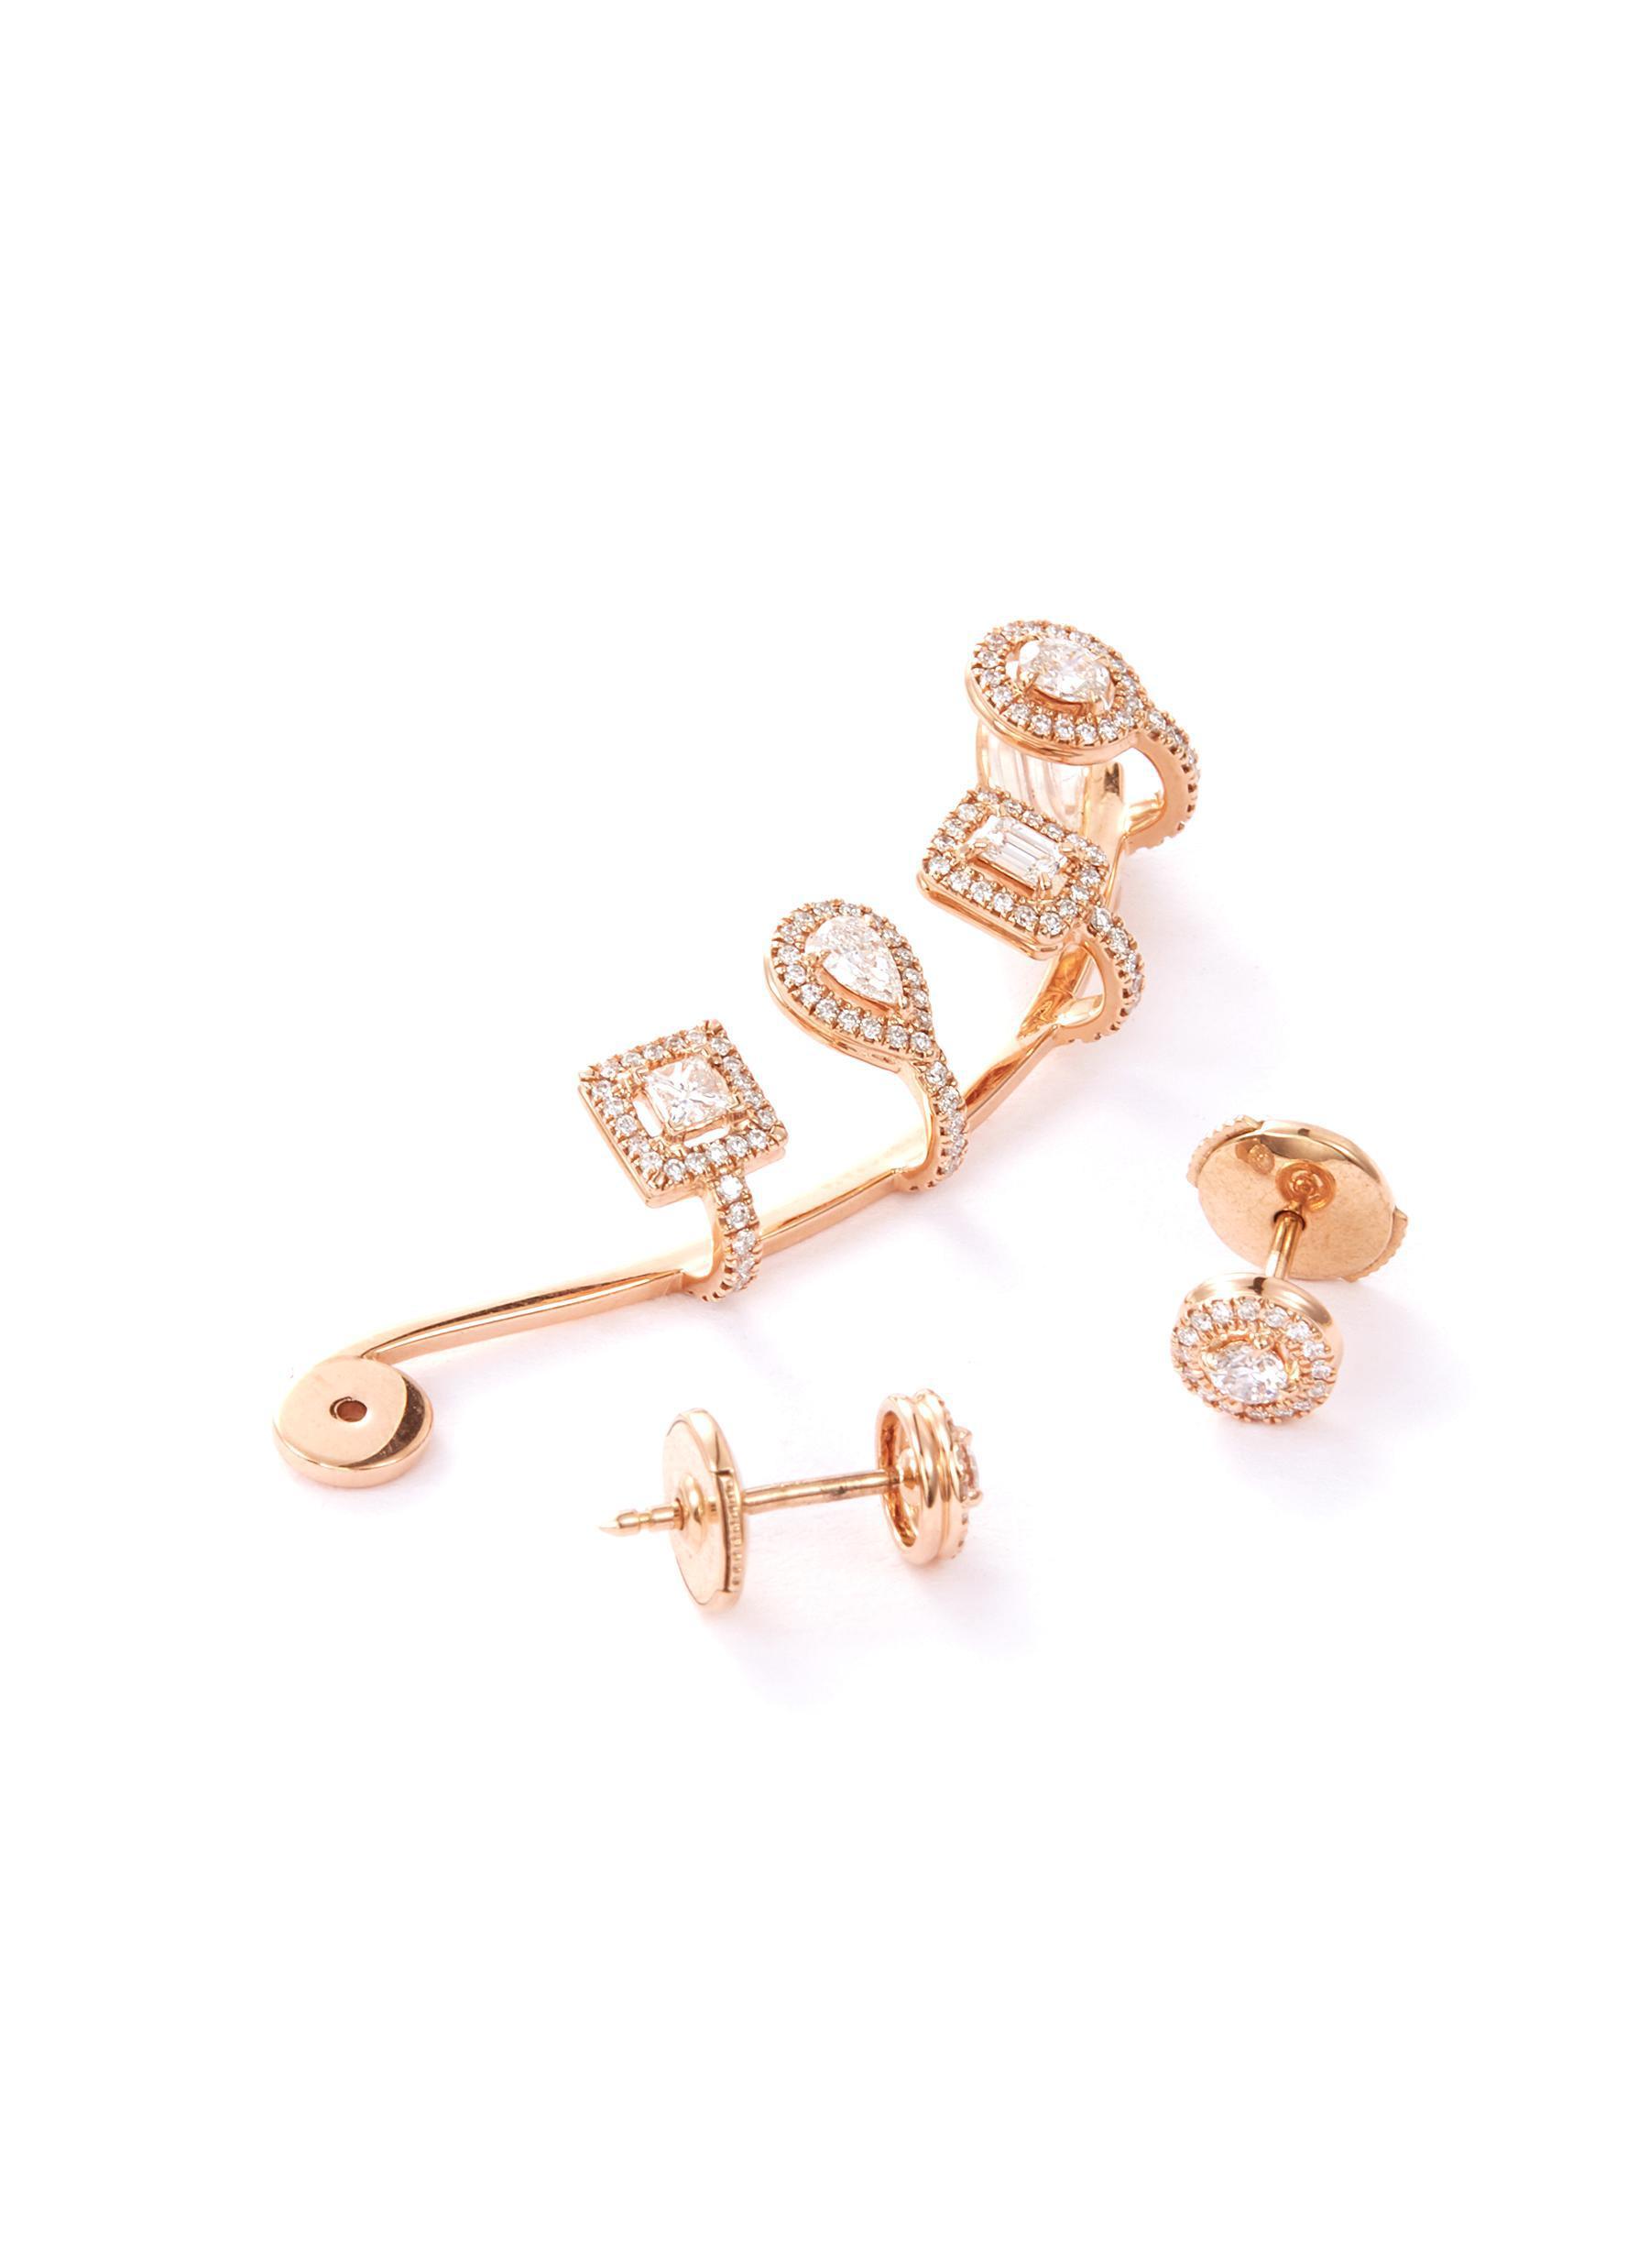 8374a86e7 Messika My Twin Multishape' Diamond 18k Rose Gold Mismatched ...